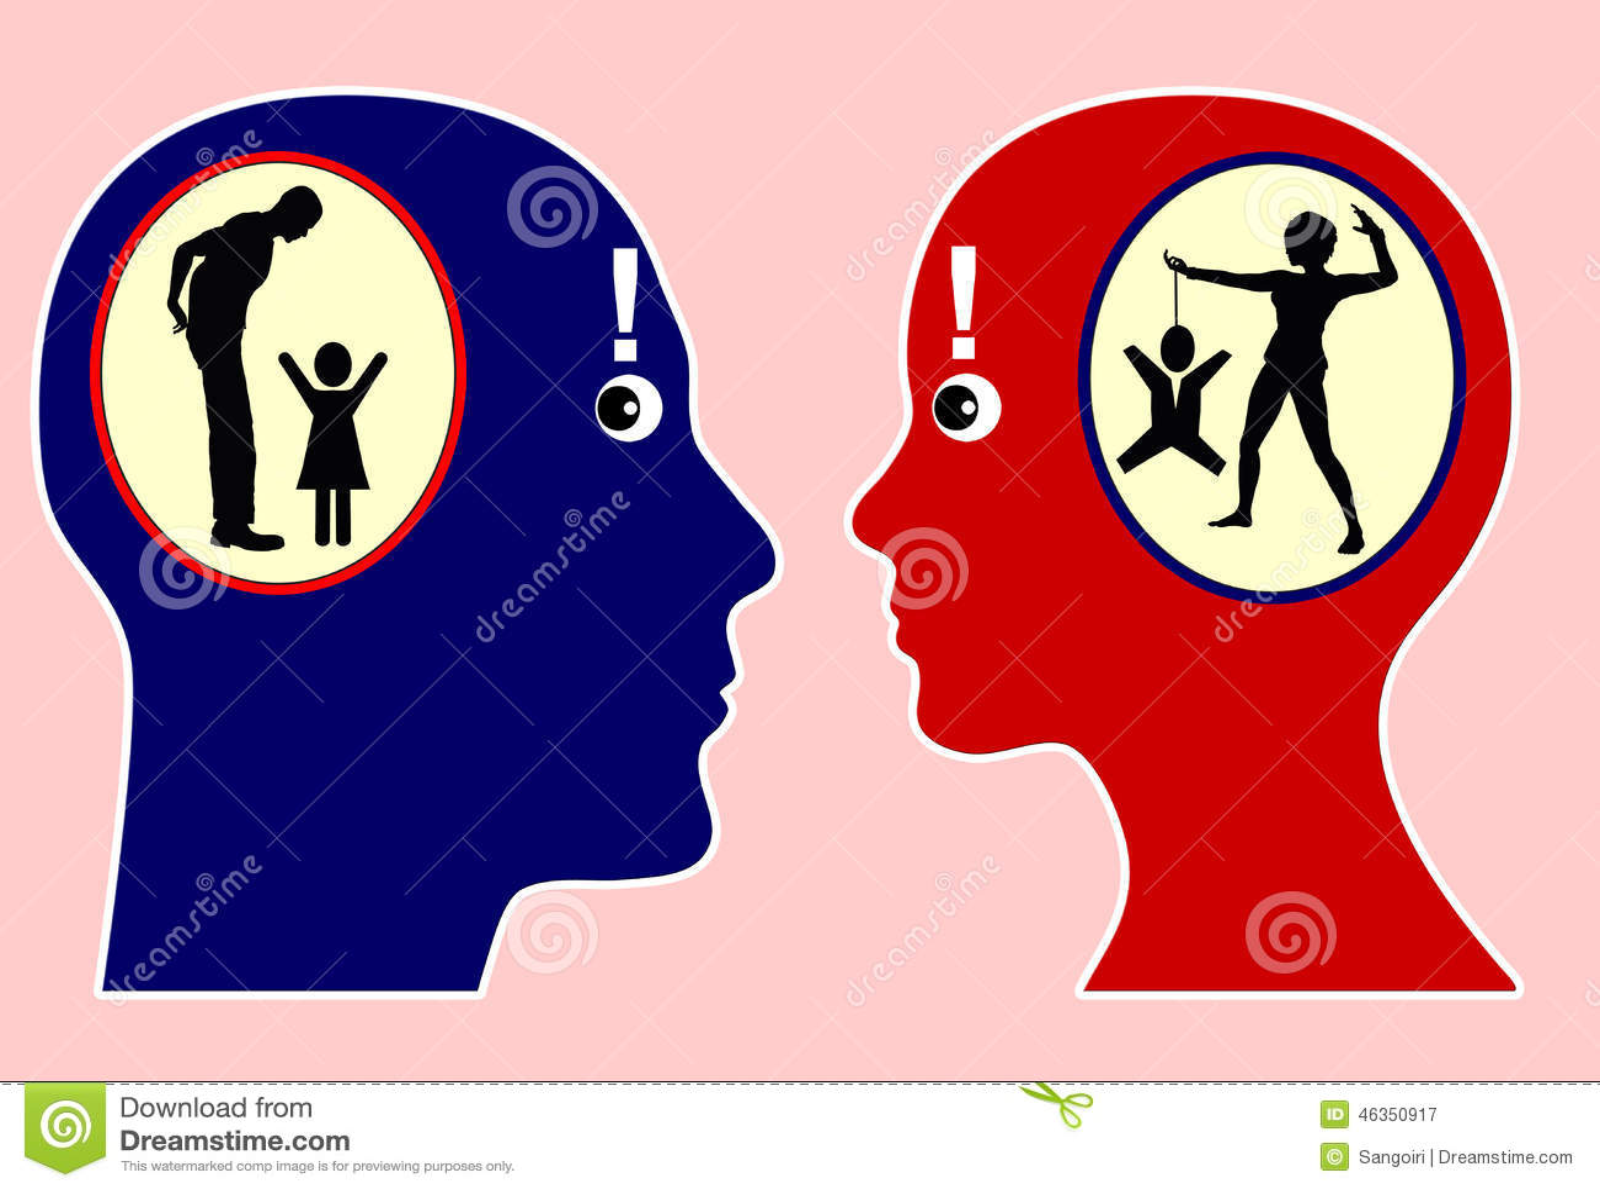 Self-Perception Theory (Bem)